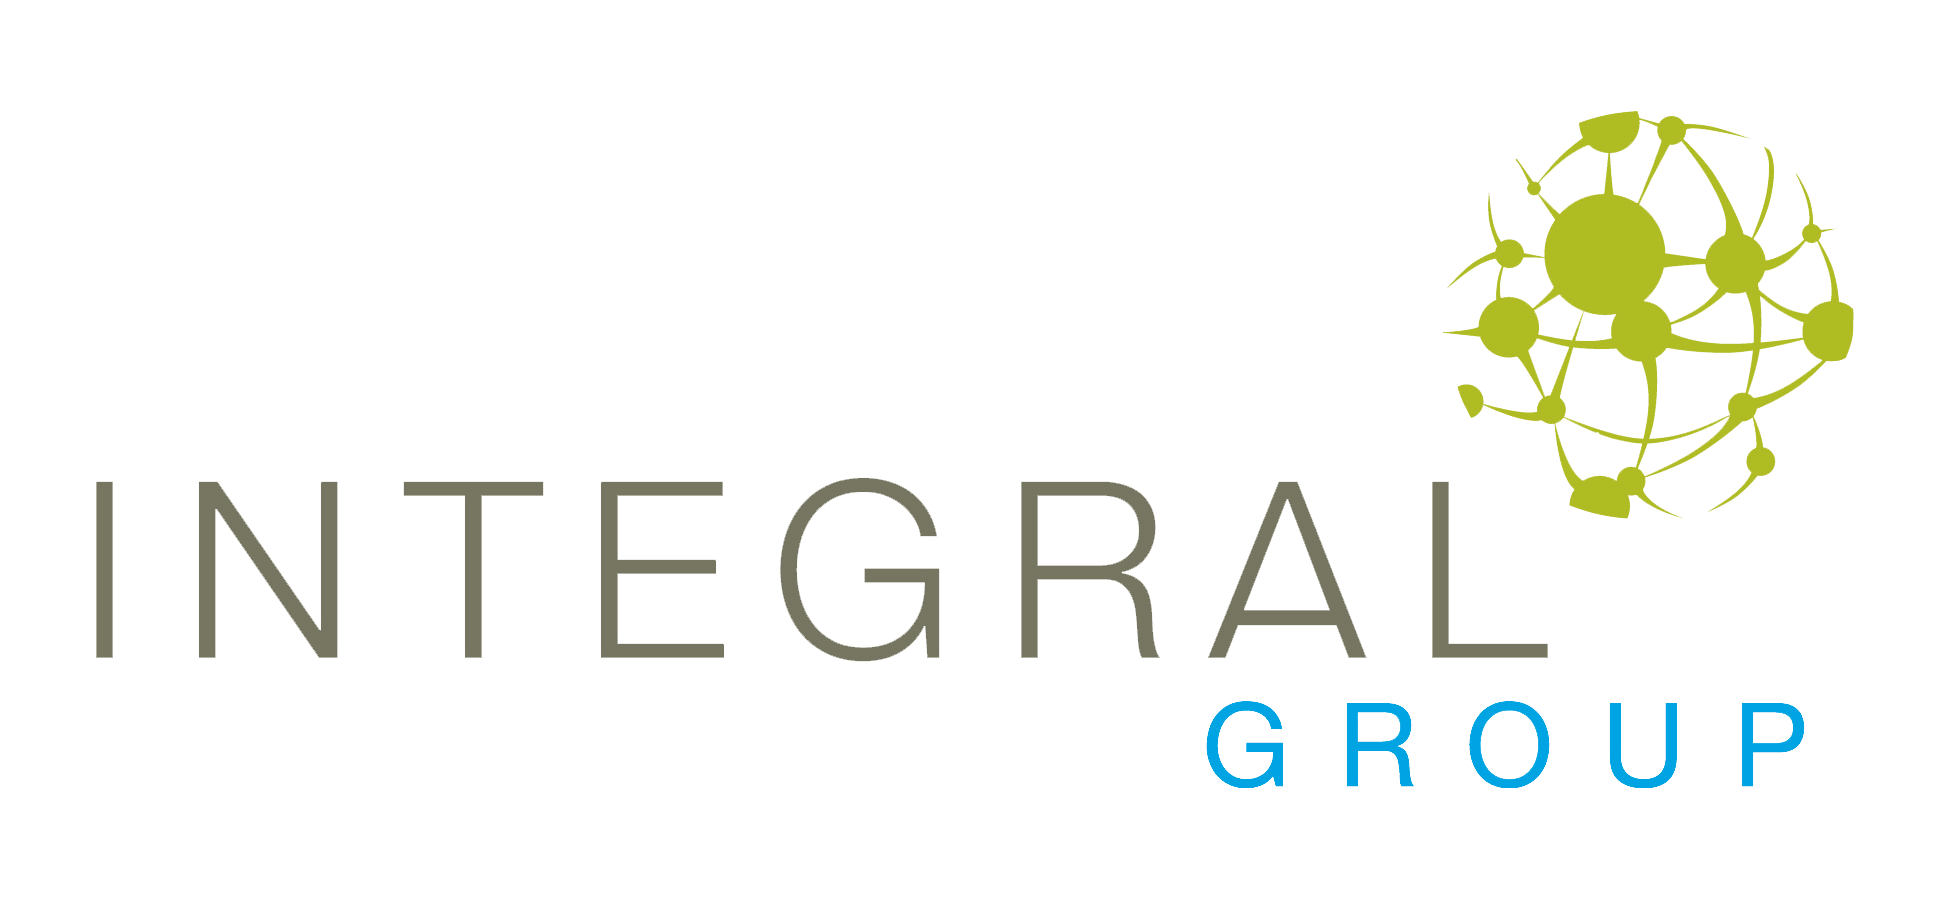 Integralgroup_Official_CMYK_Logo.png